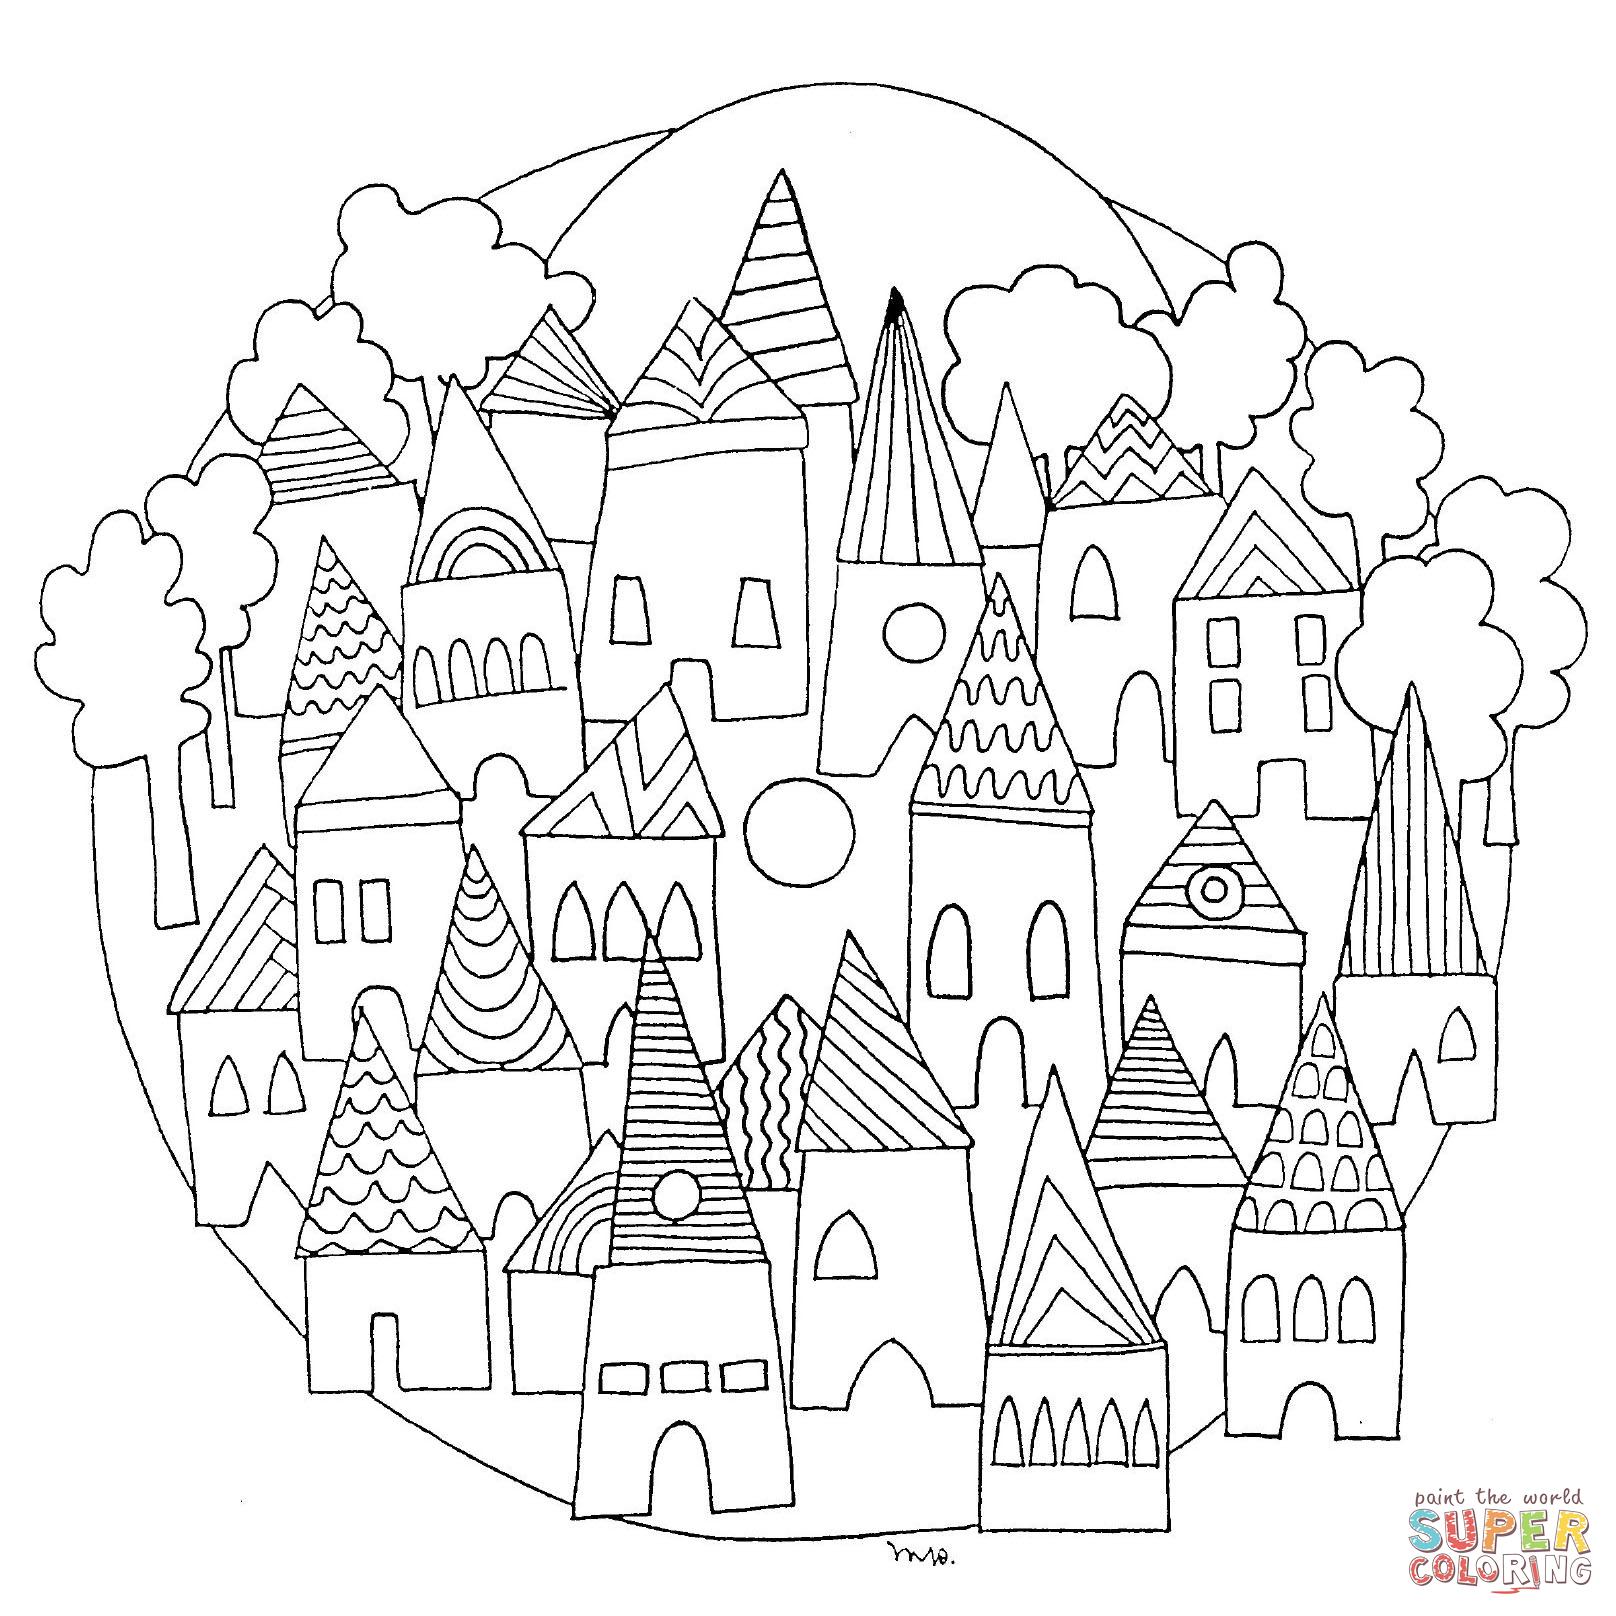 1616x1616 Cityscape Mandala Coloring Page Doodles